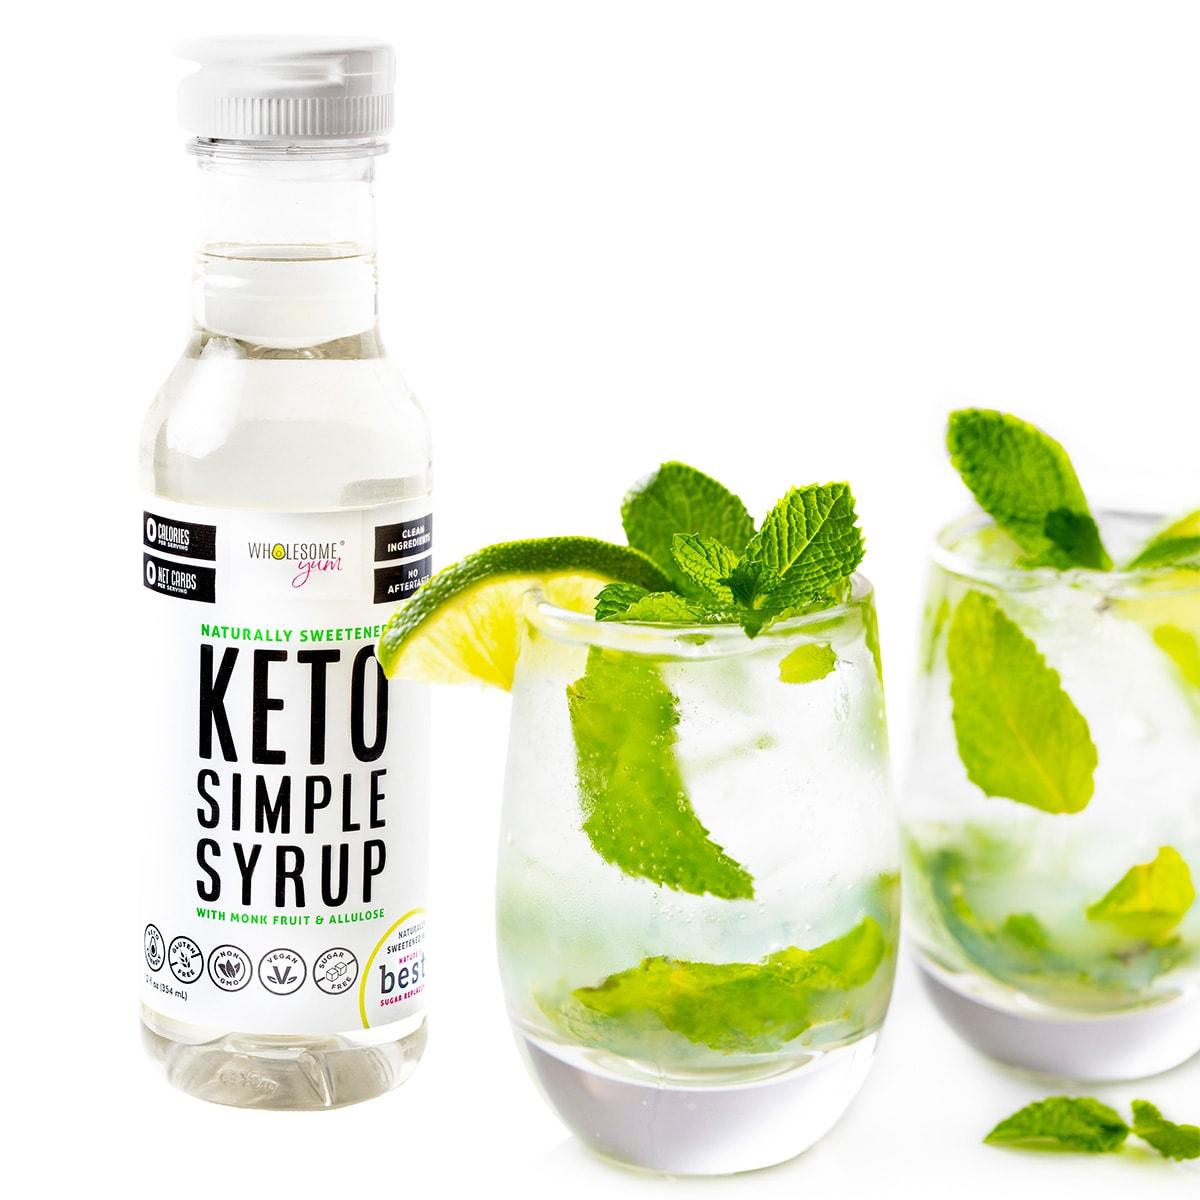 Mojitos made with Keto Simple Syrup